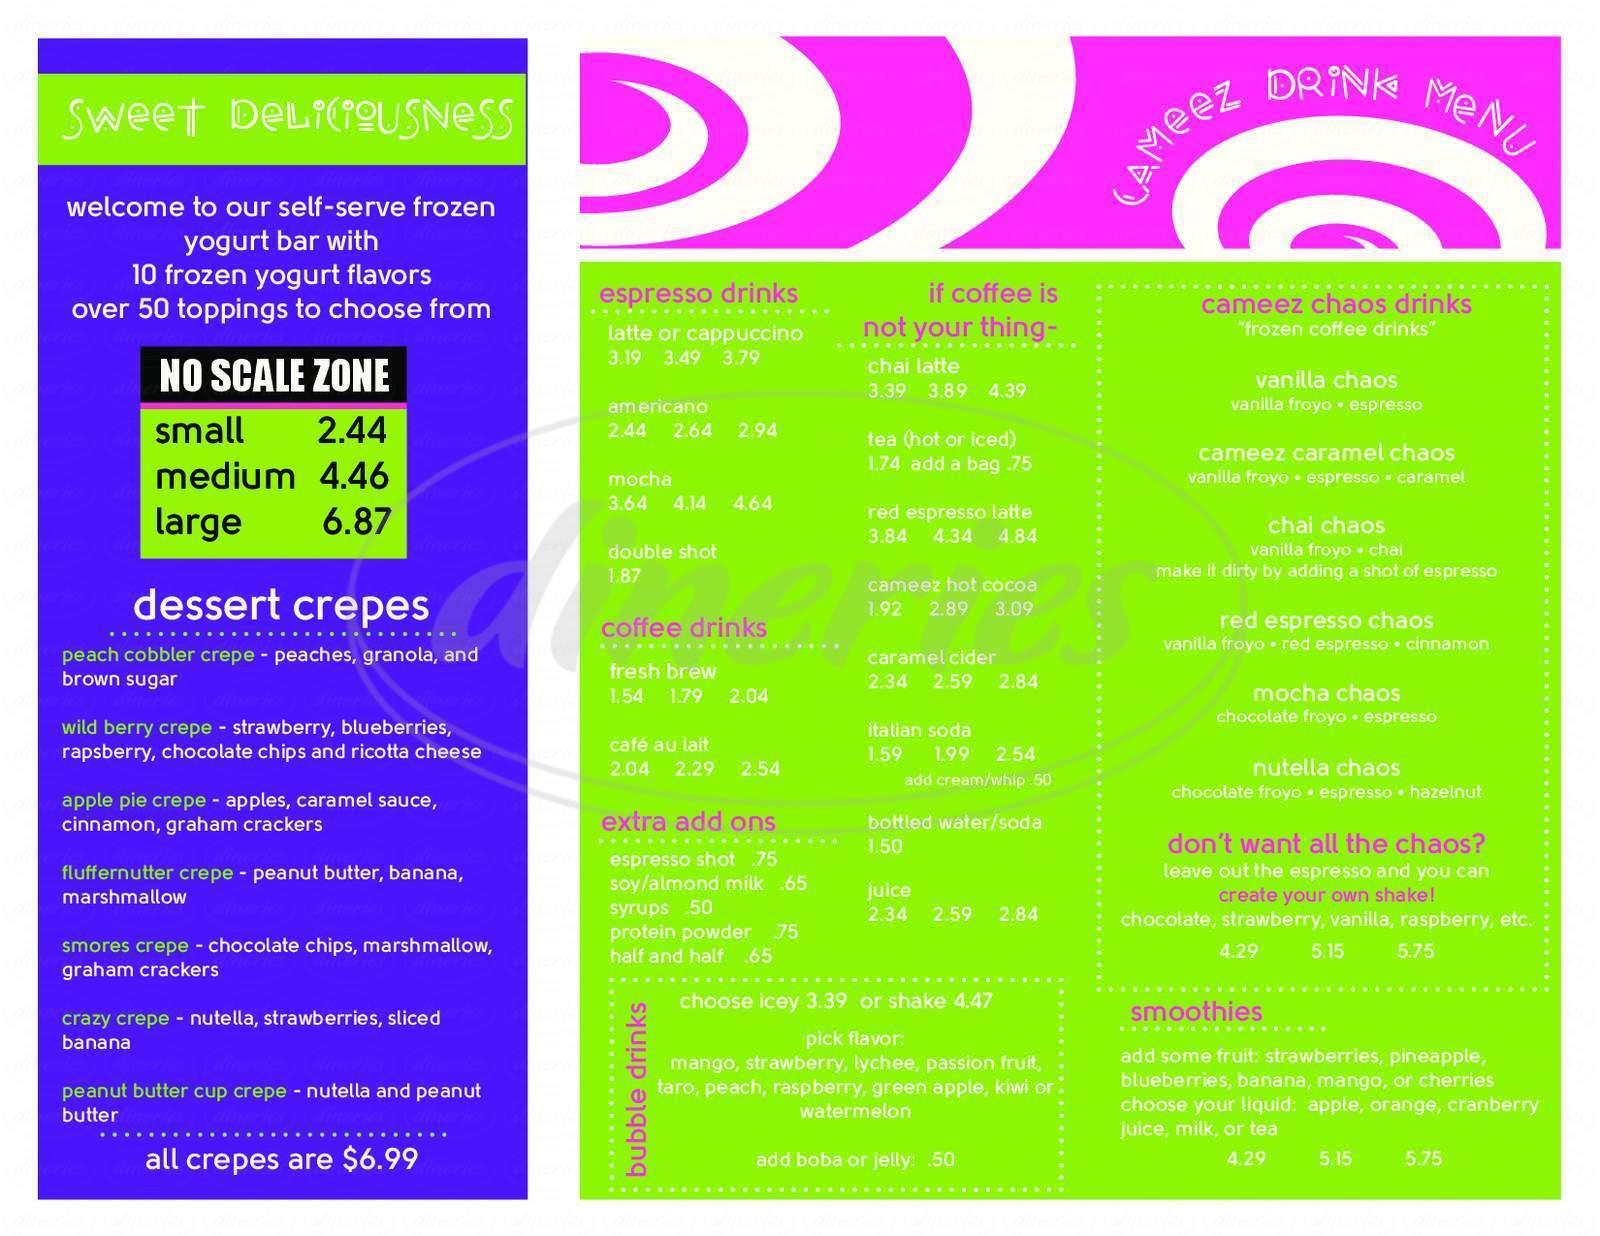 menu for Cameez